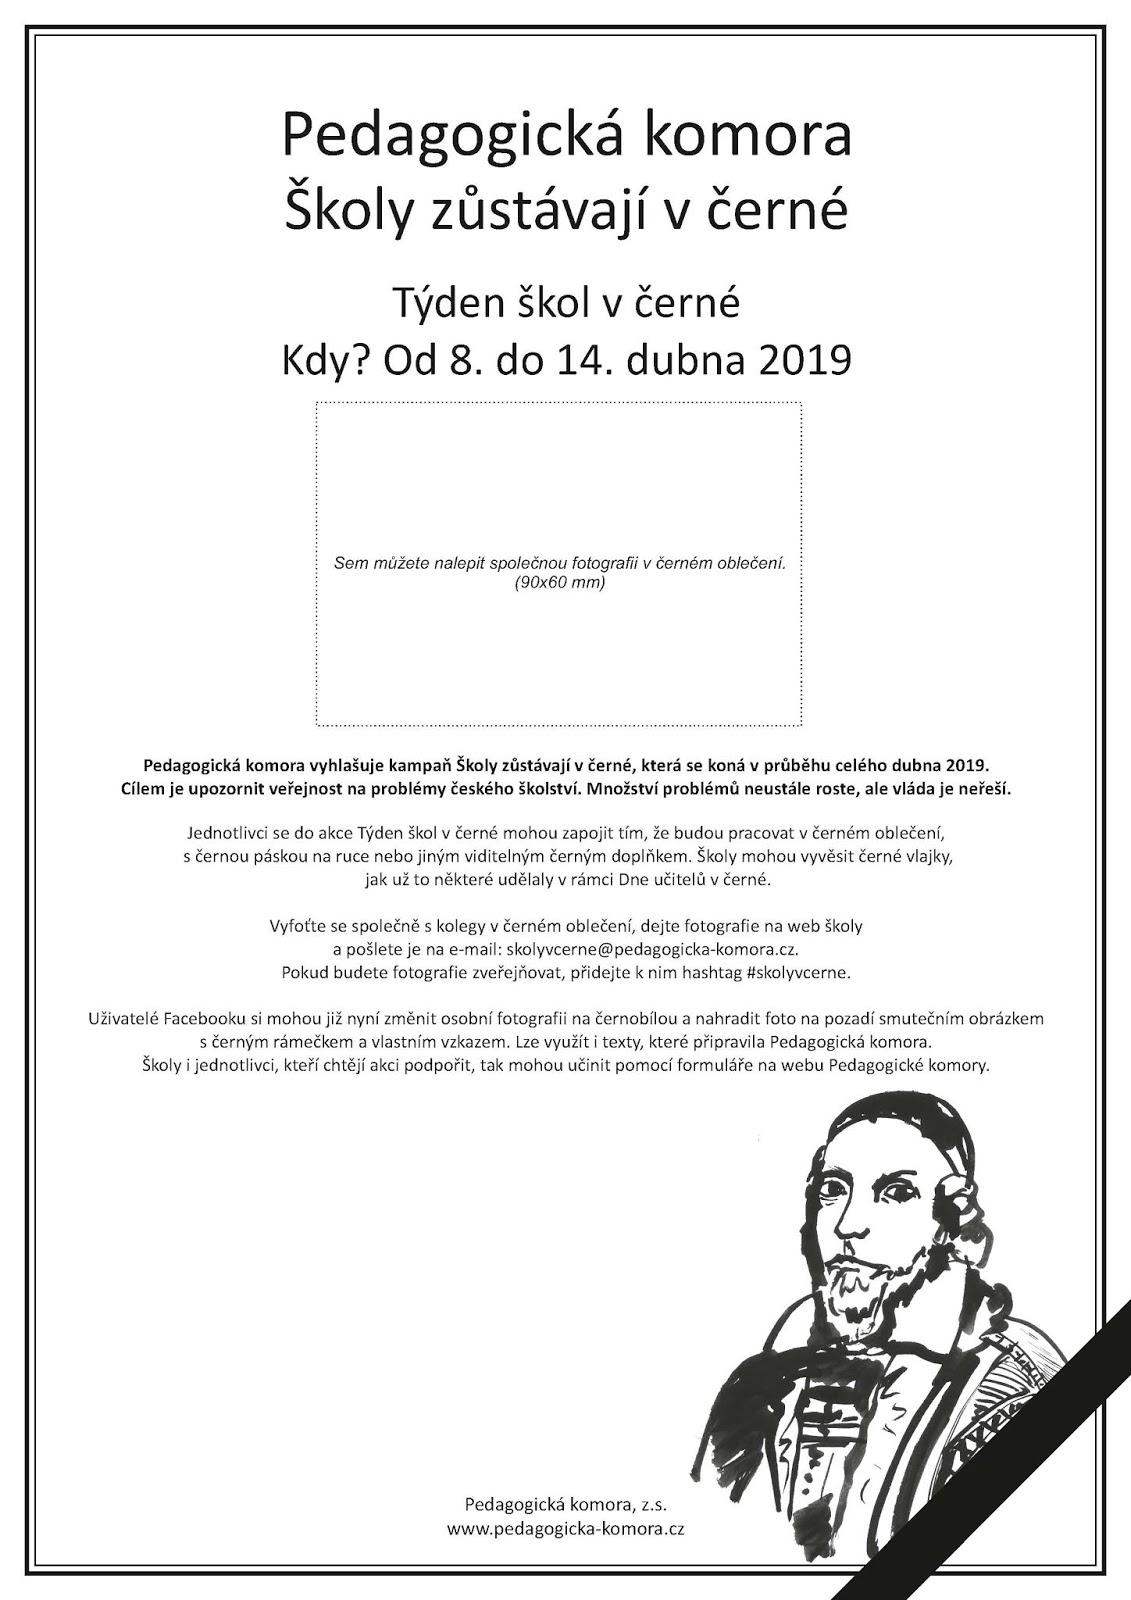 796f0e15dfc1 Pedagogicke.info  Začala akce Pedagogické komory Týden škol v černé